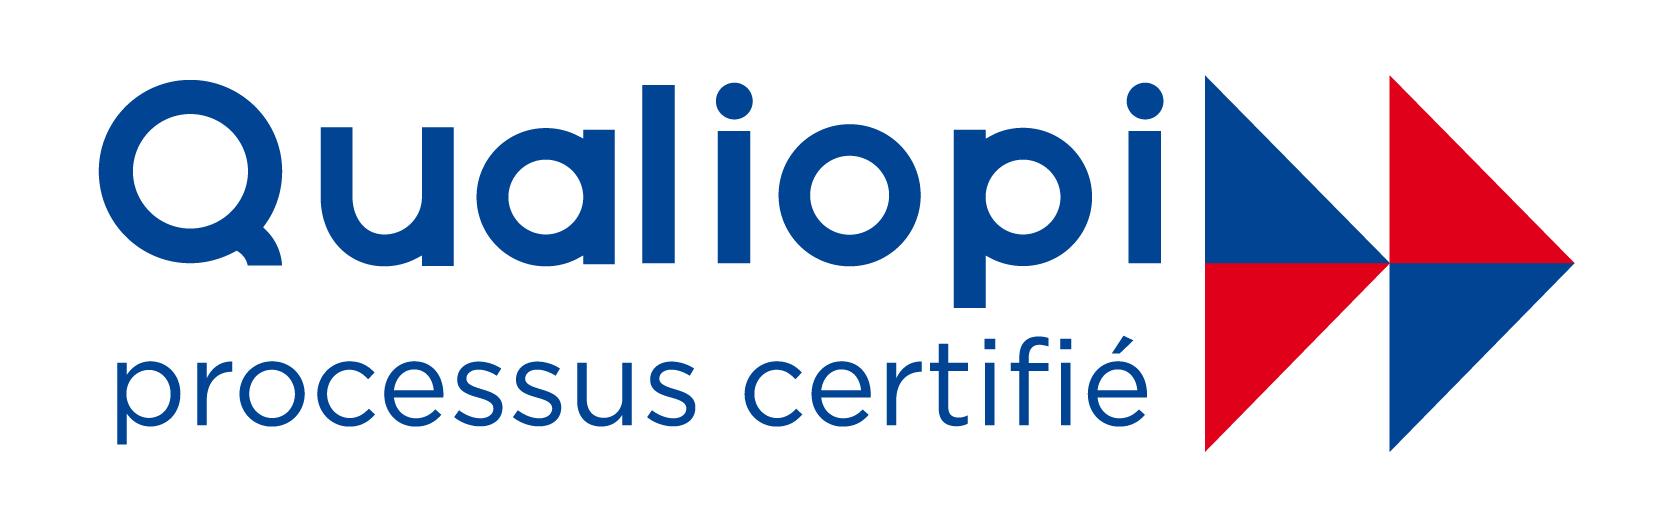 Logo Qualiopi-300dpi-Impression-56